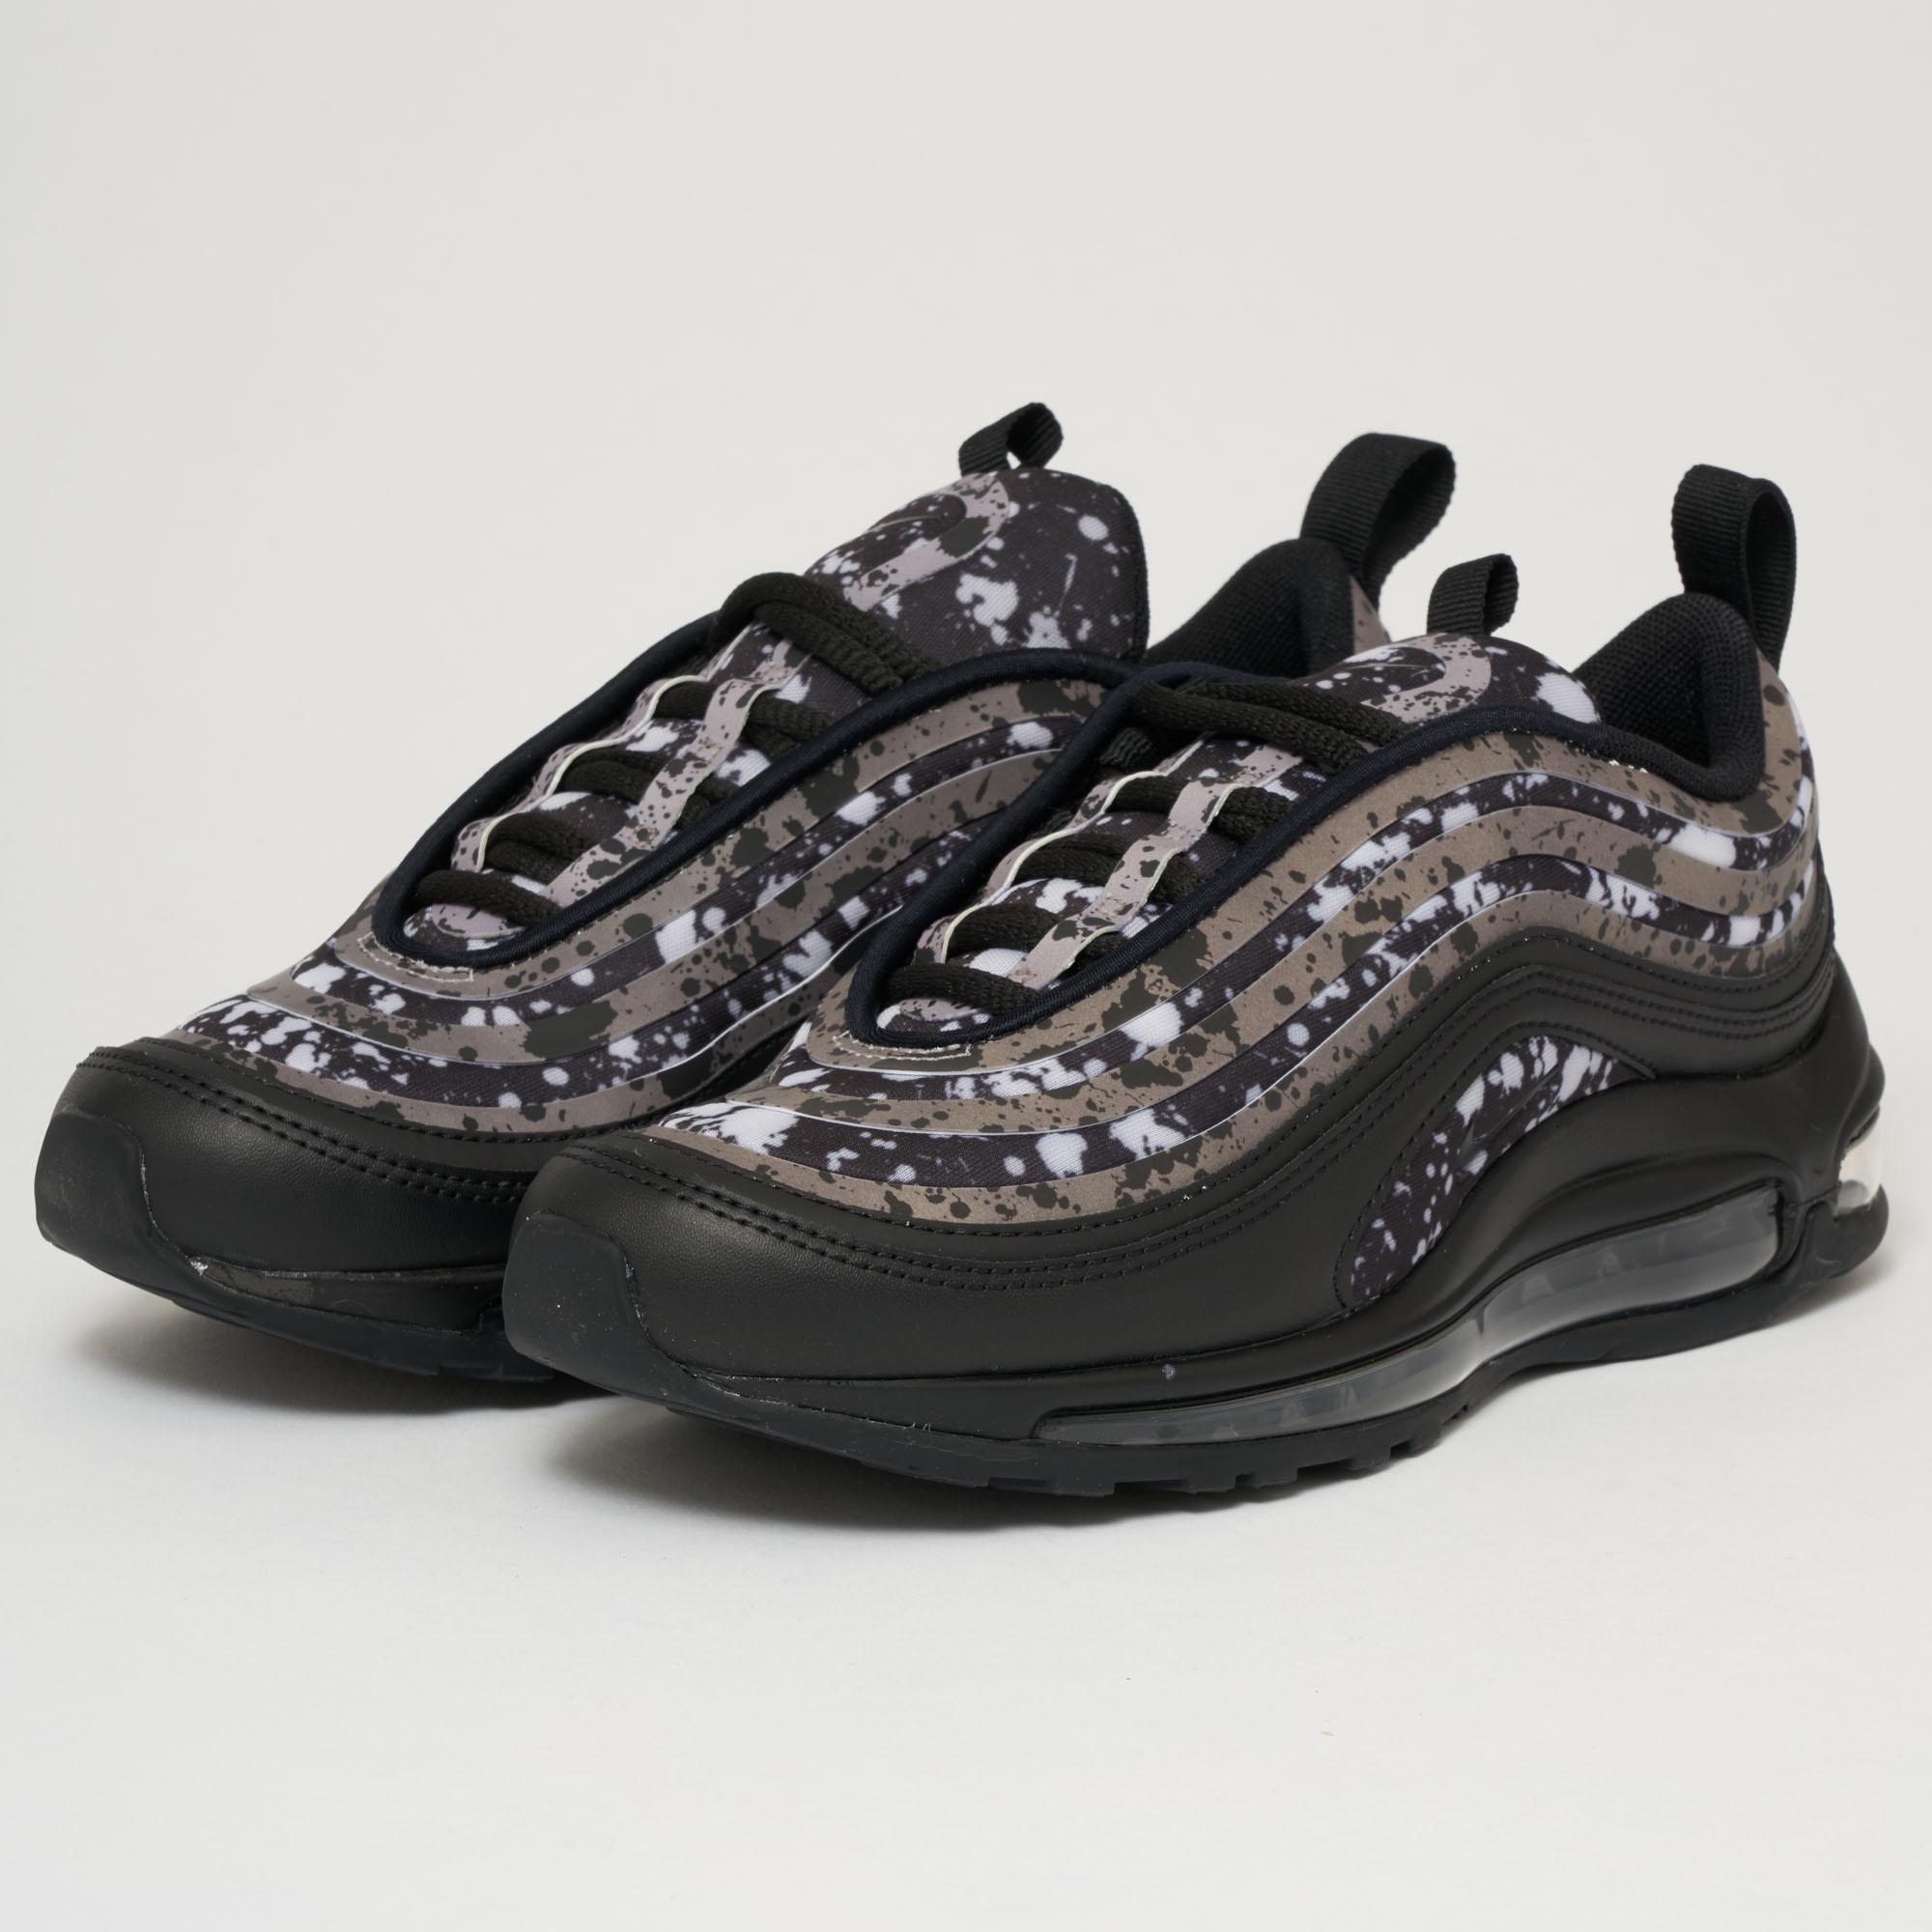 0fd3a7d1ff05 Nike Air Max 97 Ultra 17 Prm in Black for Men - Lyst